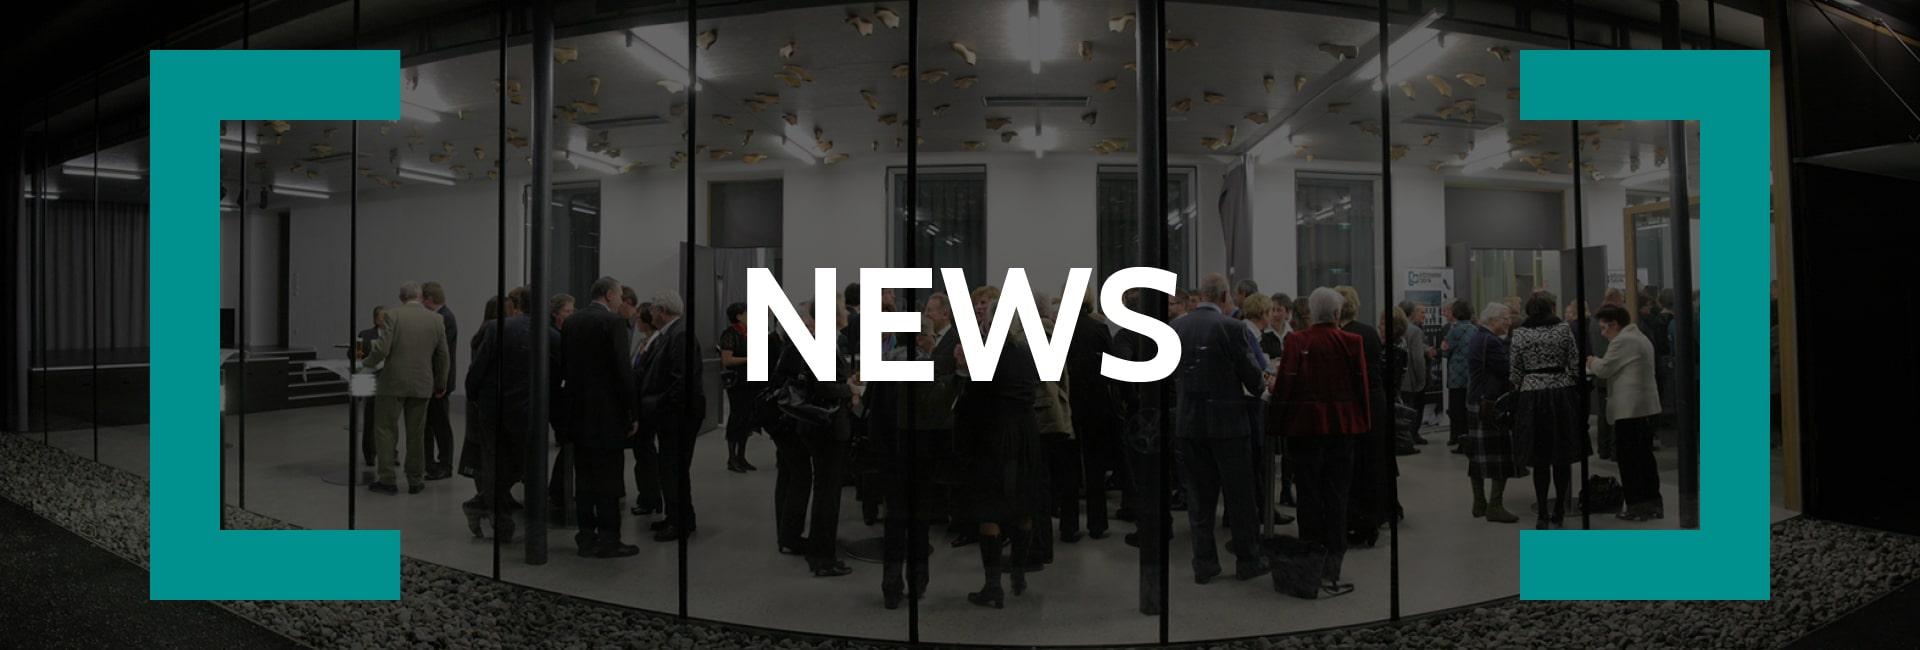 Kitzmantelfabrik_Header_News